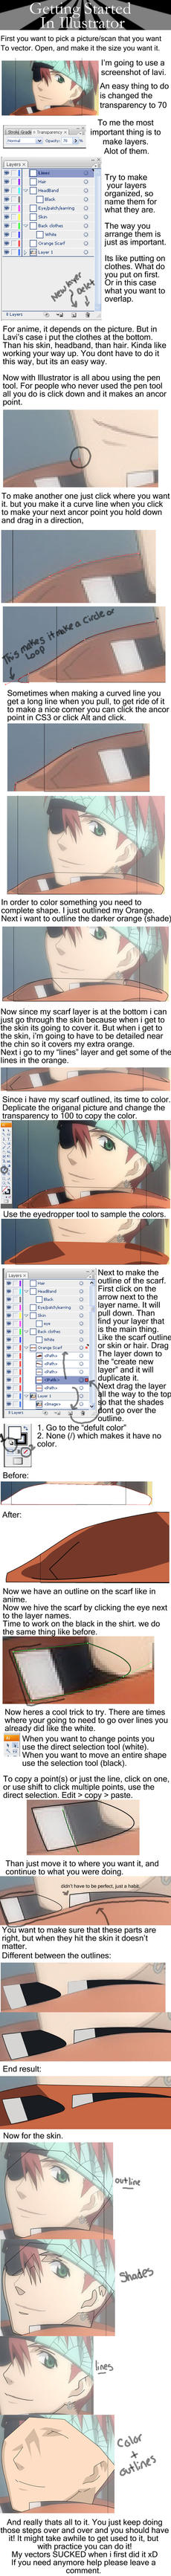 Adobe Illustrator Tutoral by EdElricsGirl